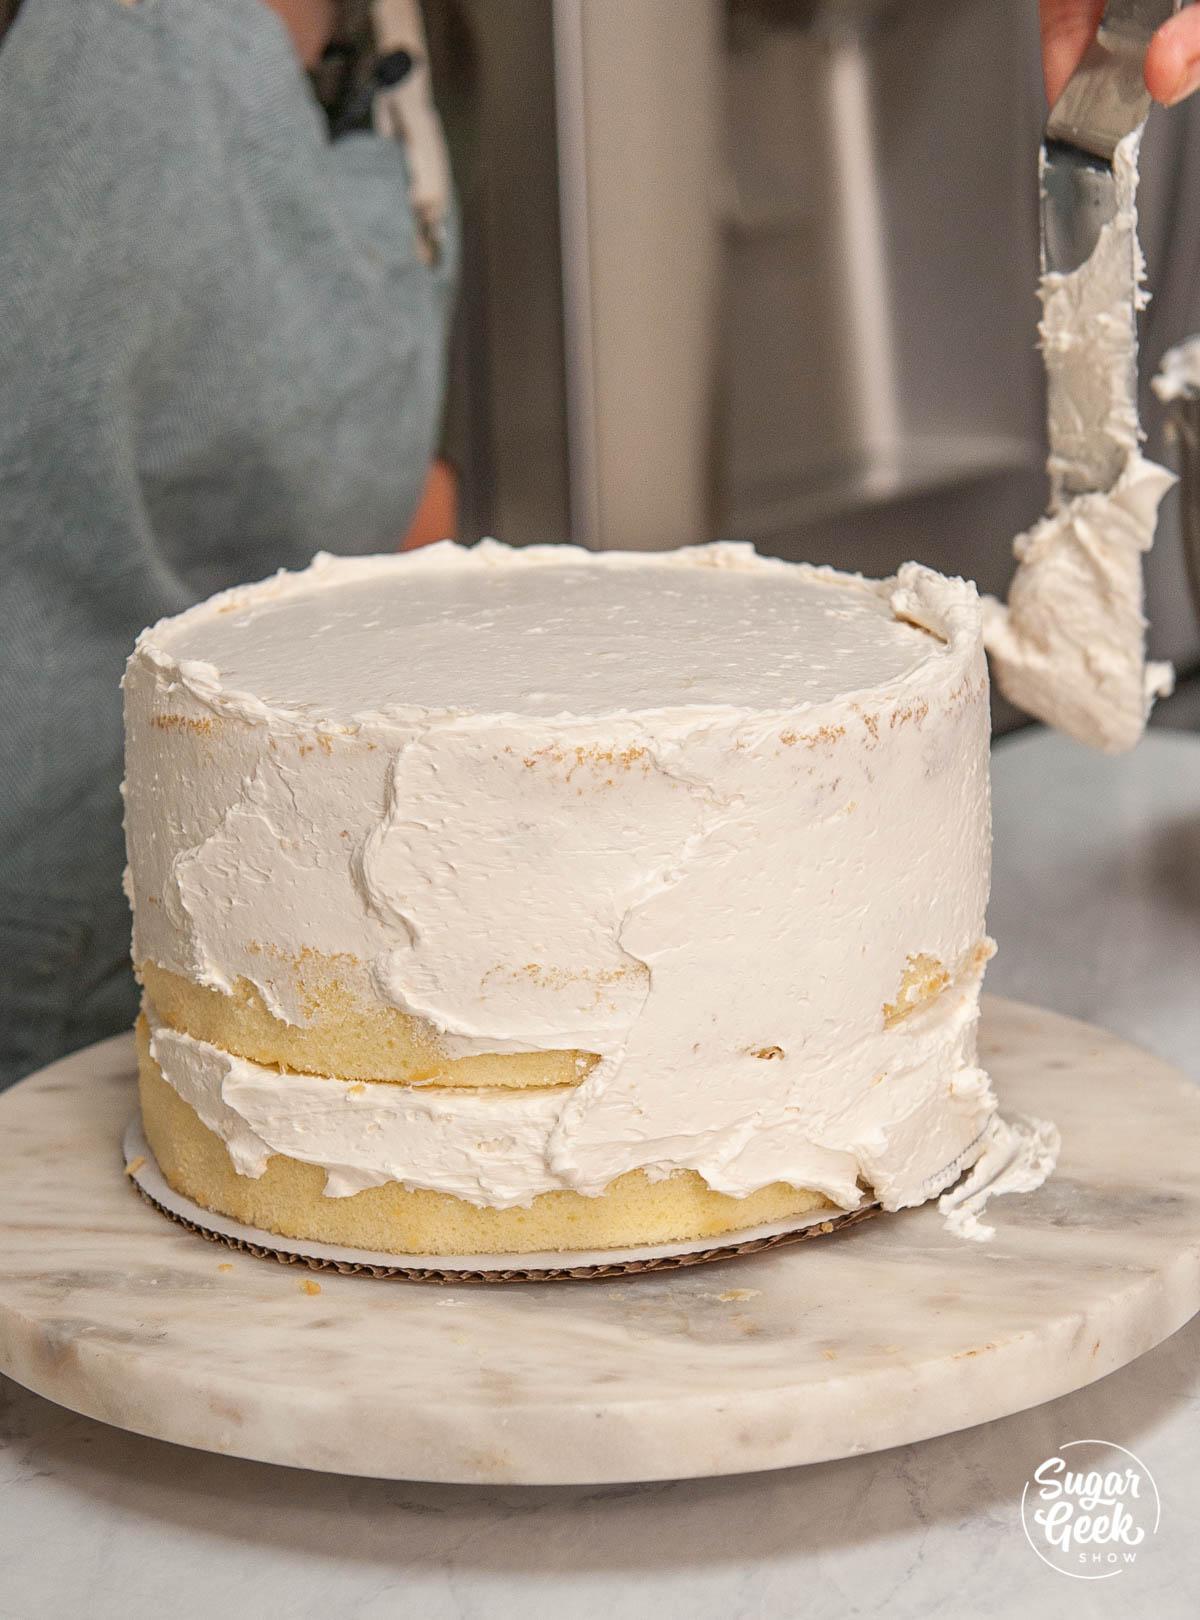 vanilla cake with a crumb coat